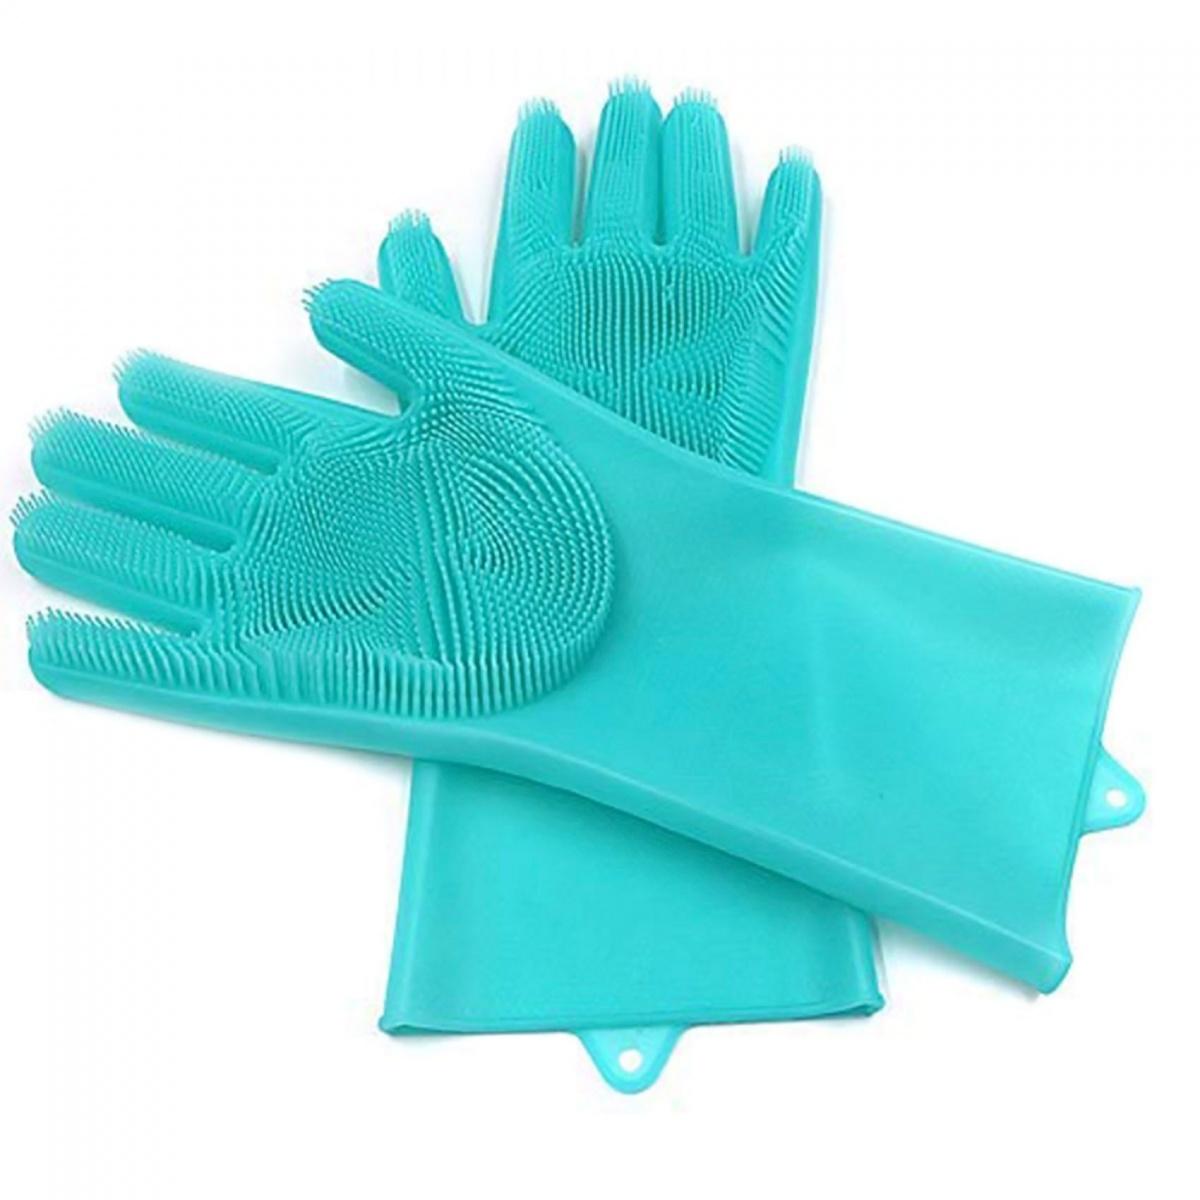 Silicone Sponge Dish Washing Cleaning Gloves - Blue